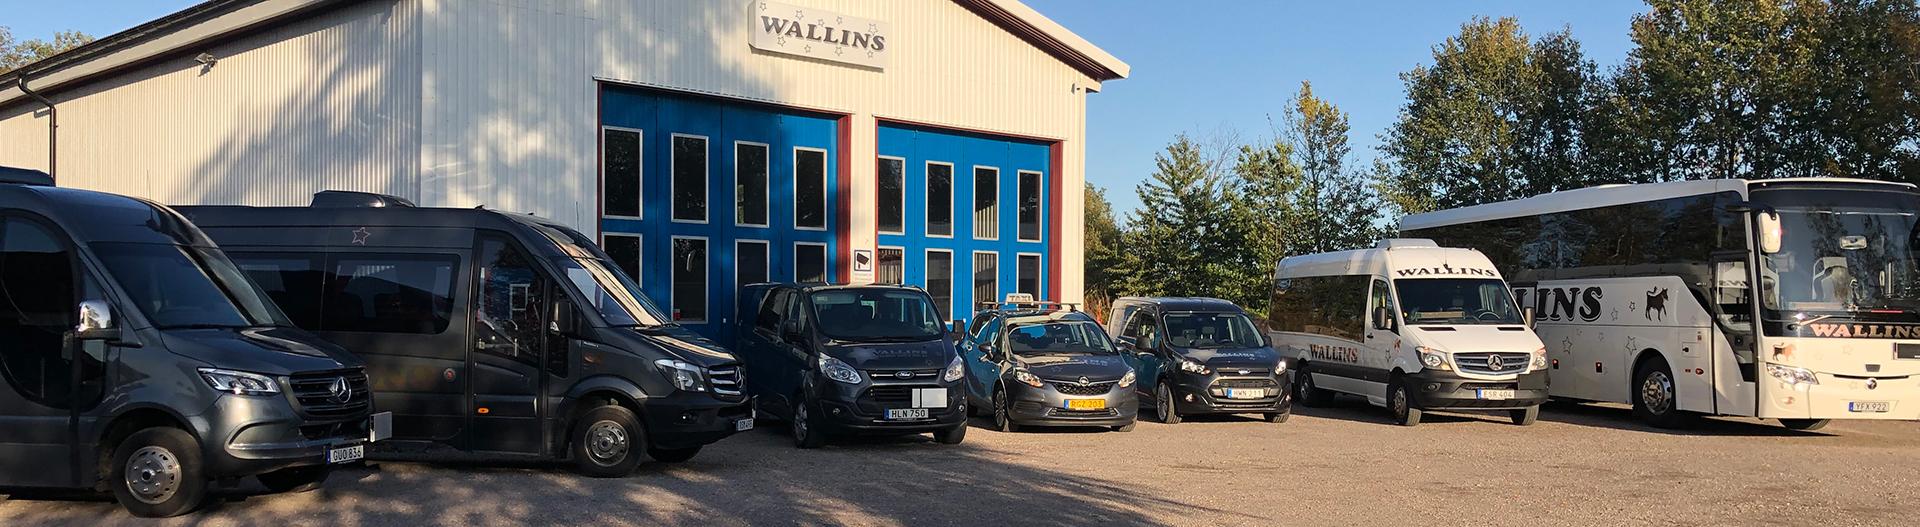 Wallins Brålanda Buss & Taxi AB - Buss- och taxiresor i Dalsland